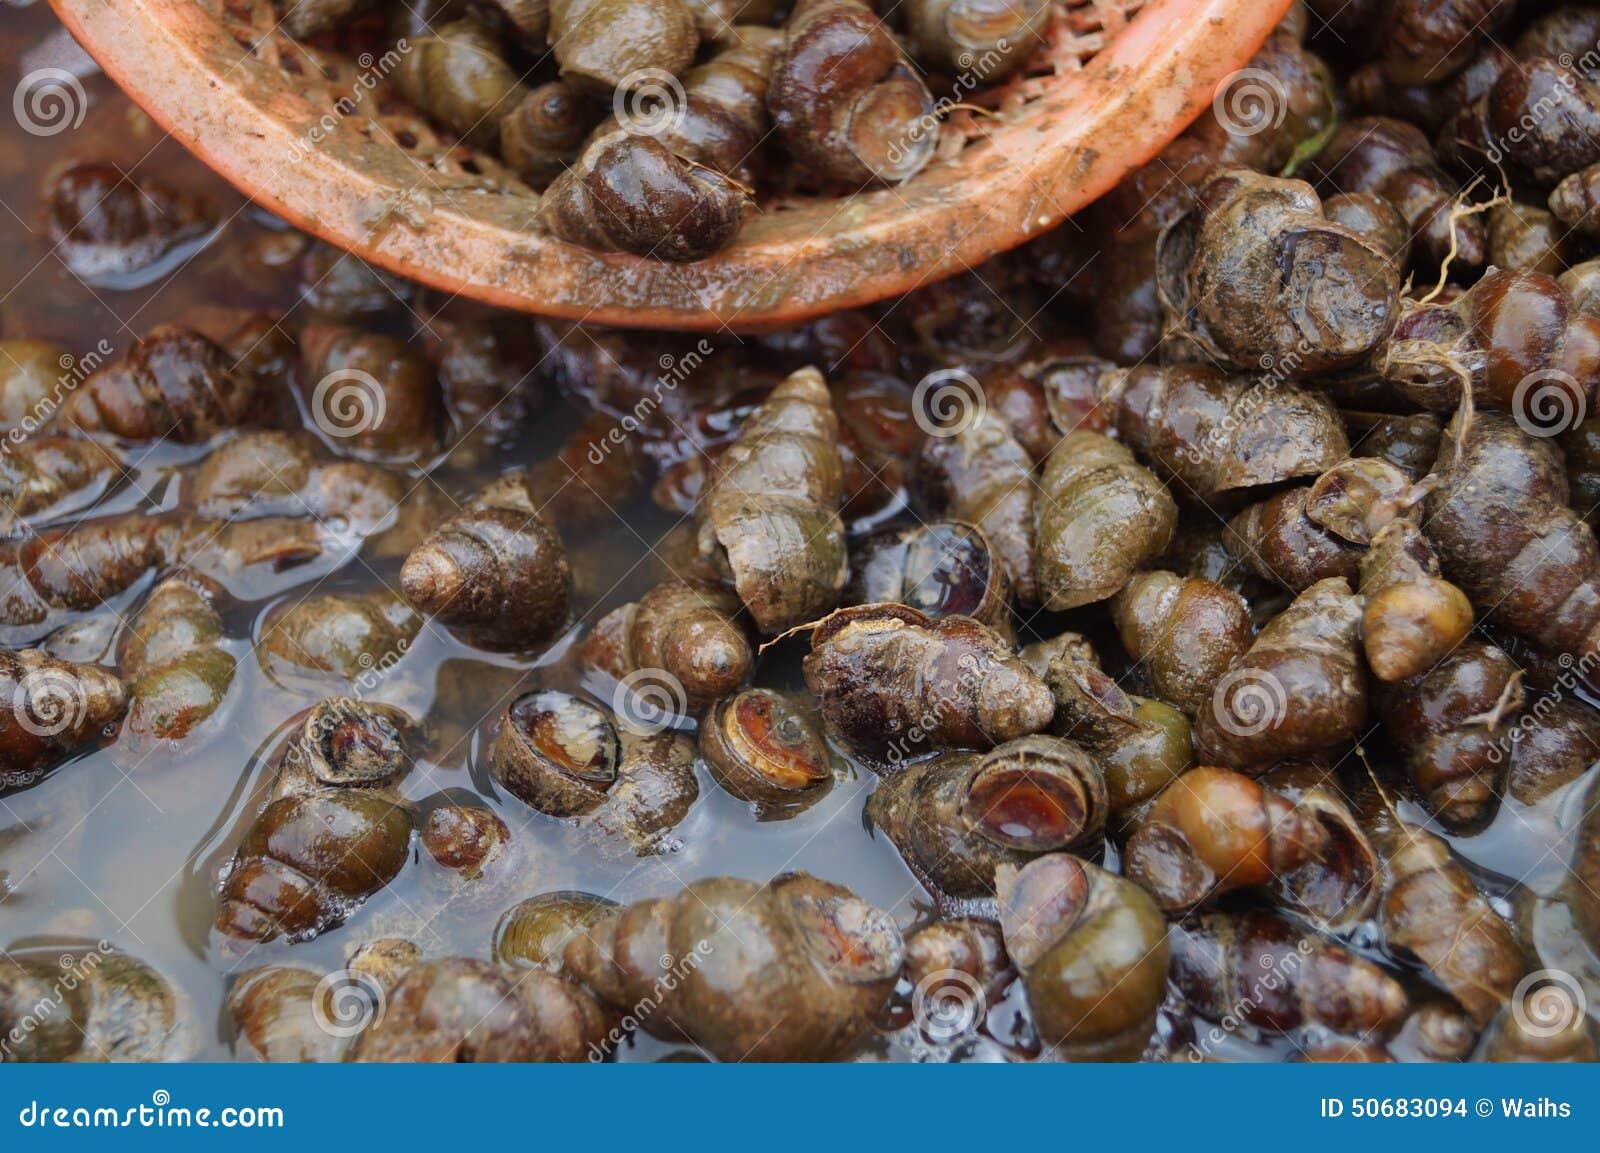 Download 巧克力精炼机 库存照片. 图片 包括有 海洋, 仍然, 茴香, 关闭, 海鲜, 巧克力精炼机, 销售额, 传记 - 50683094